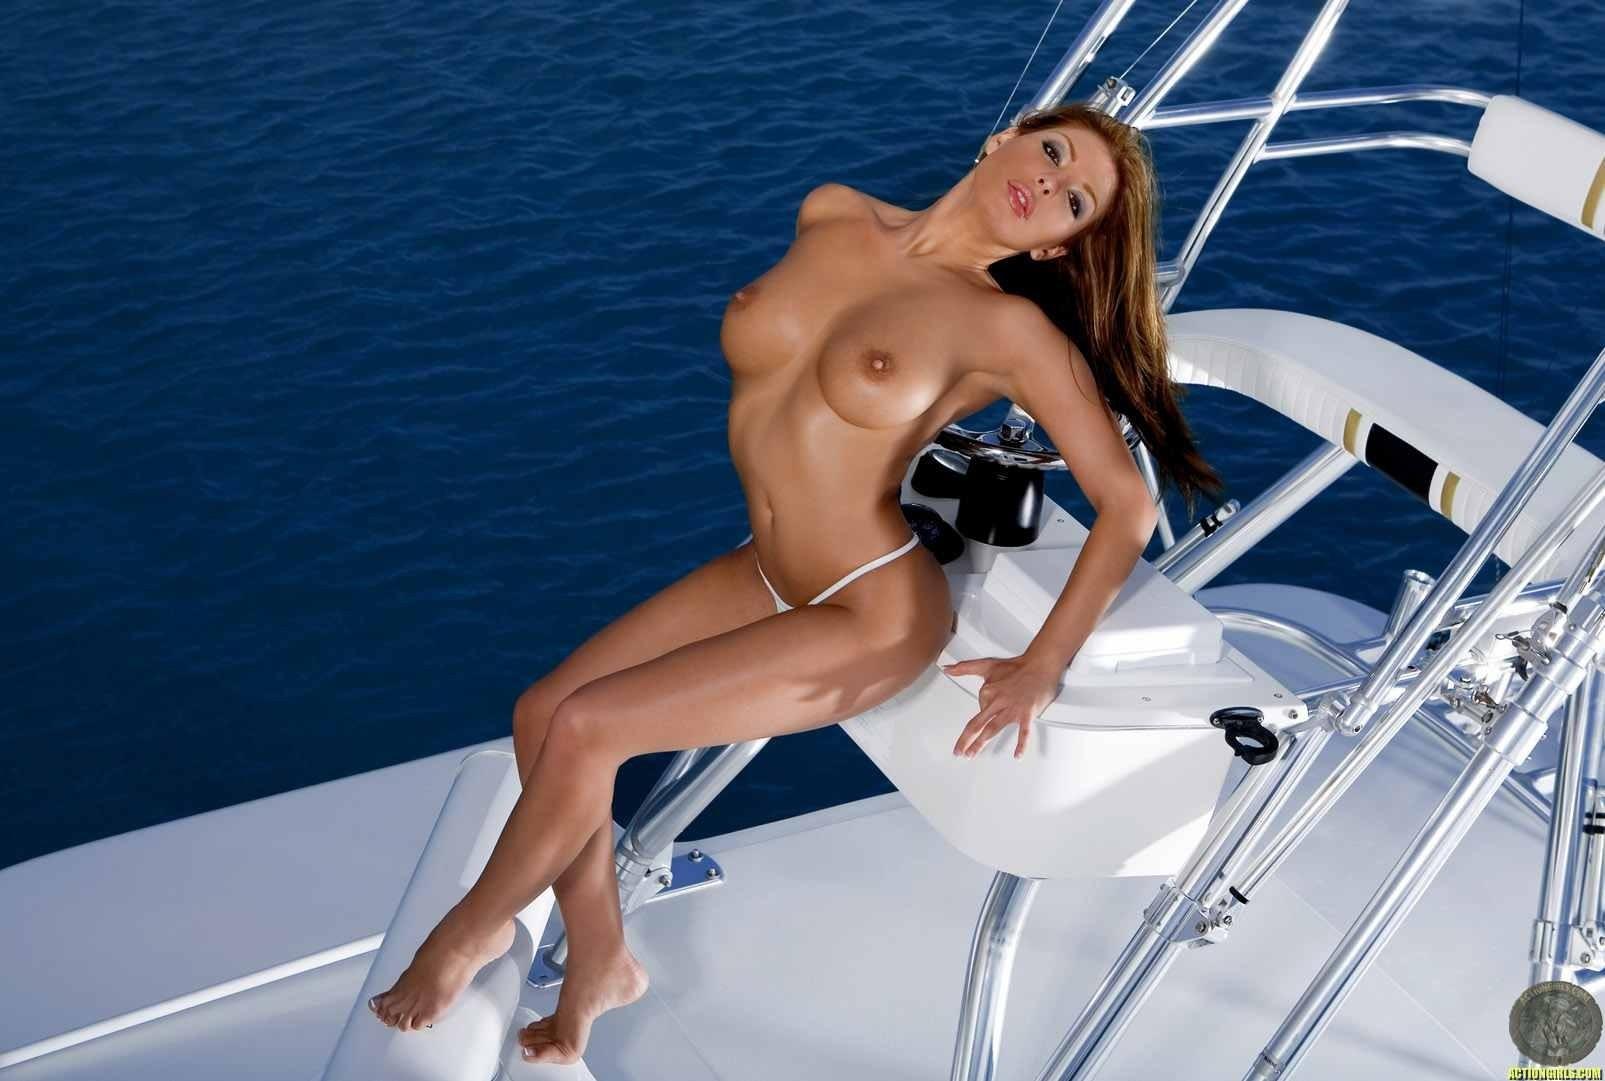 fuck-with-bikini-boat